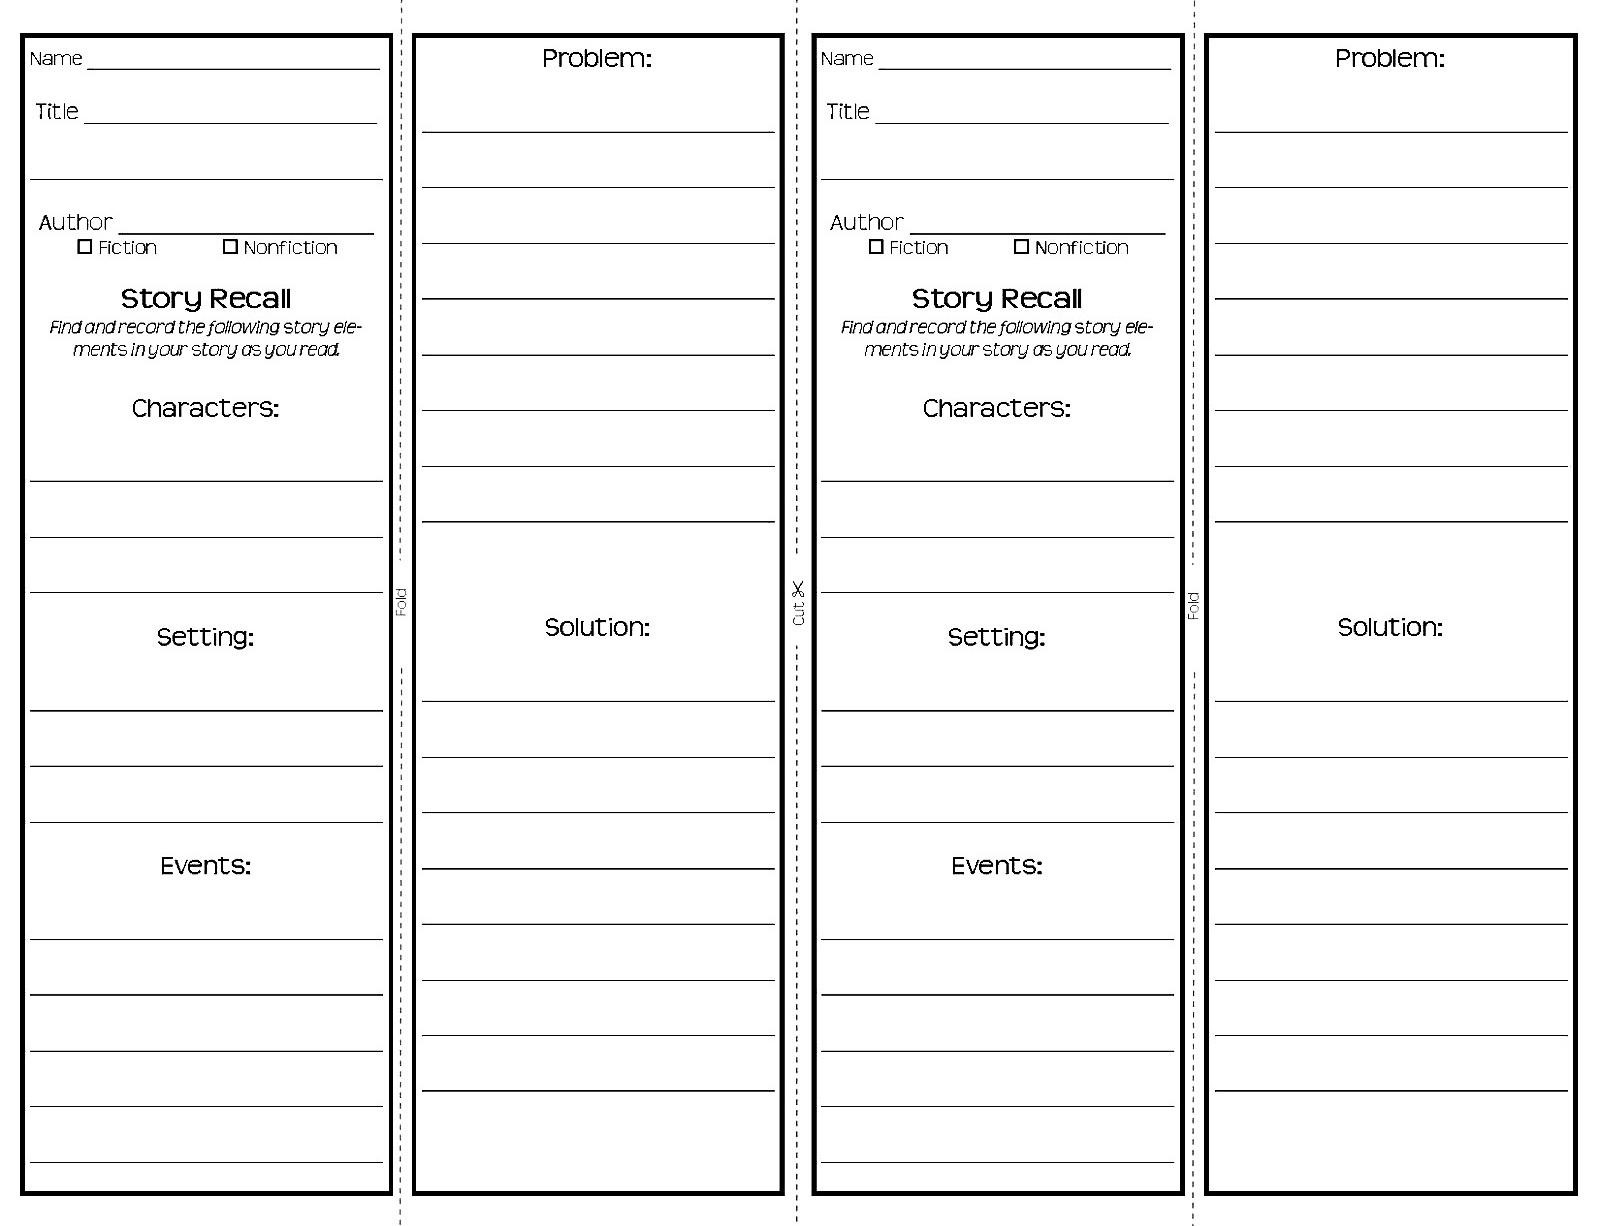 Bookmark design template